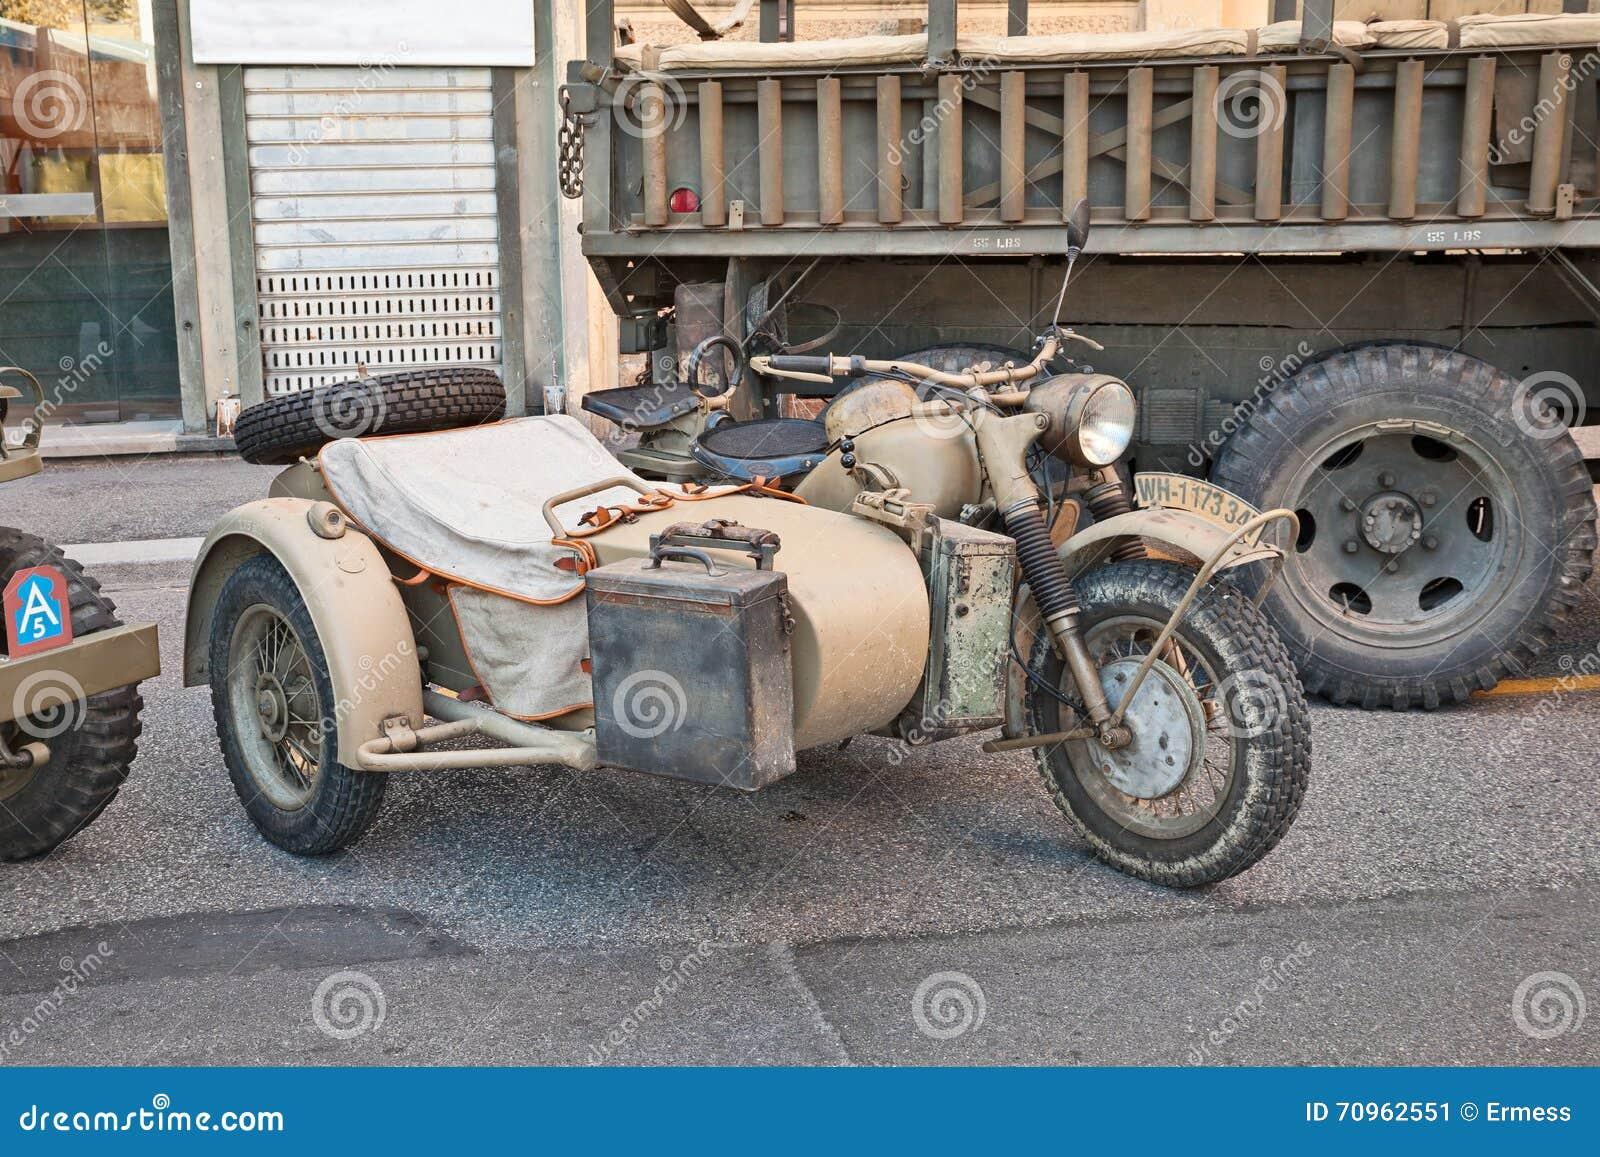 German Military Bike BMW R75 Editorial Photo - Image of historical